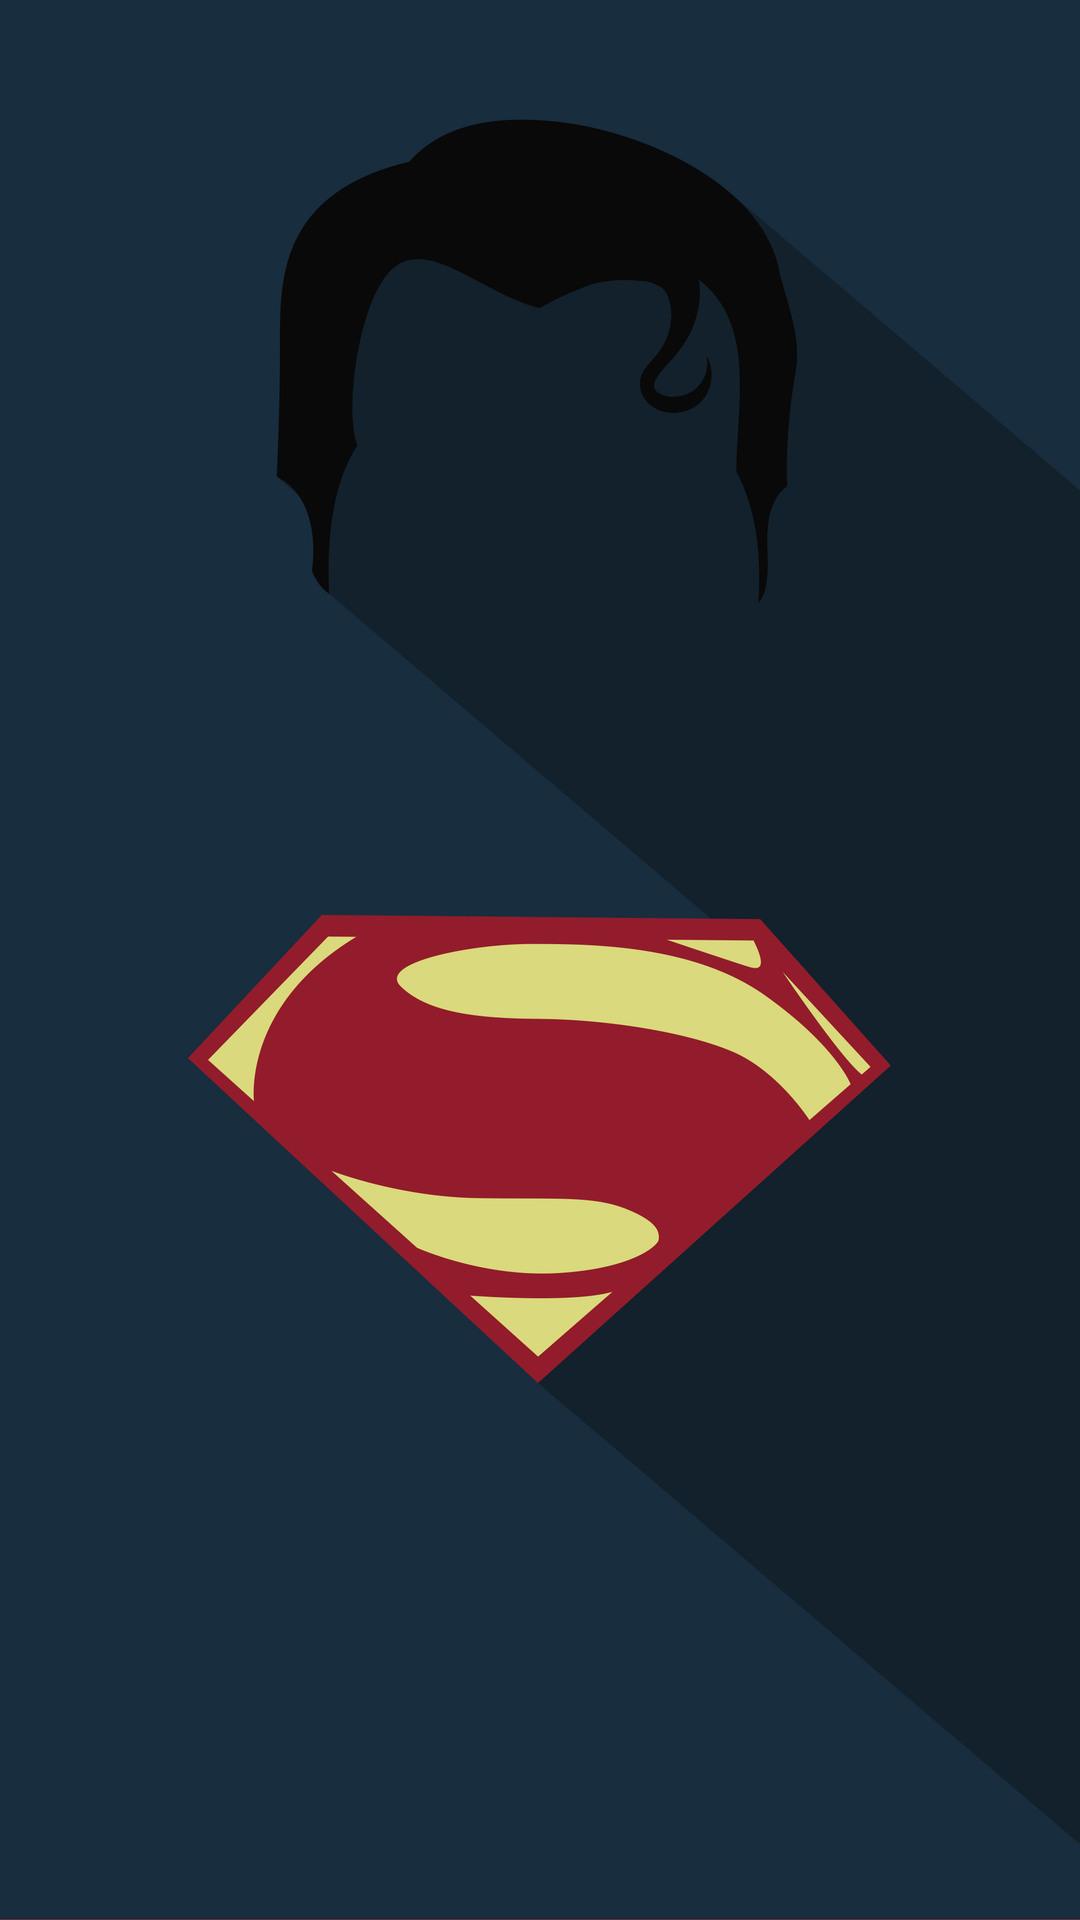 Superman Minimalism Poster Img